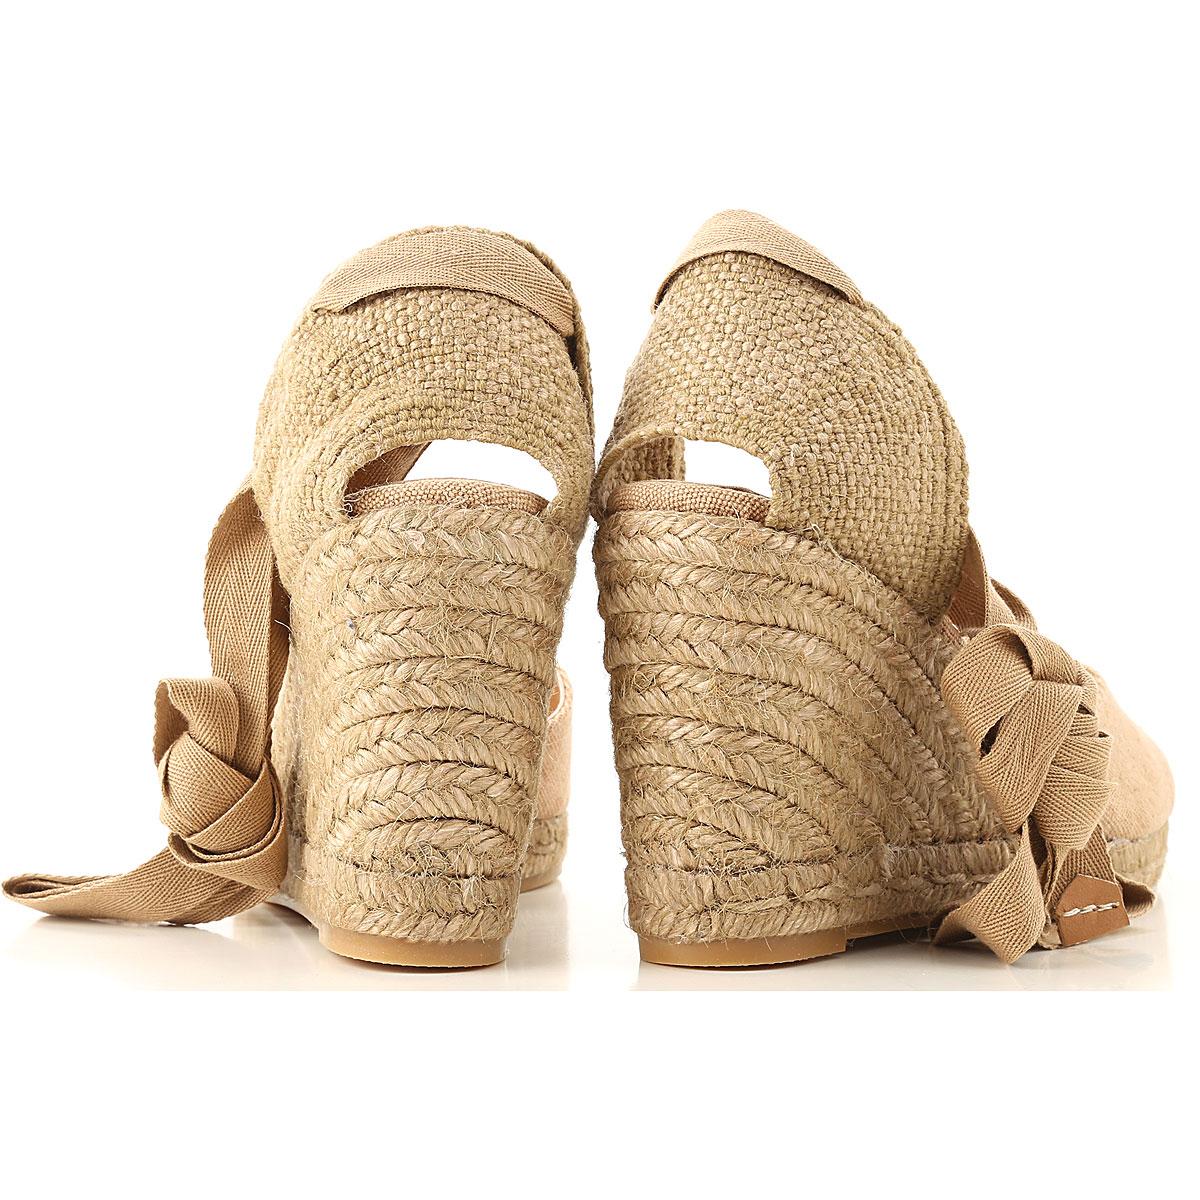 3d3510375 2019 Ahumado Castaner Mujer verano Zapatos Para nbsp; Primavera qrfYwX6xf